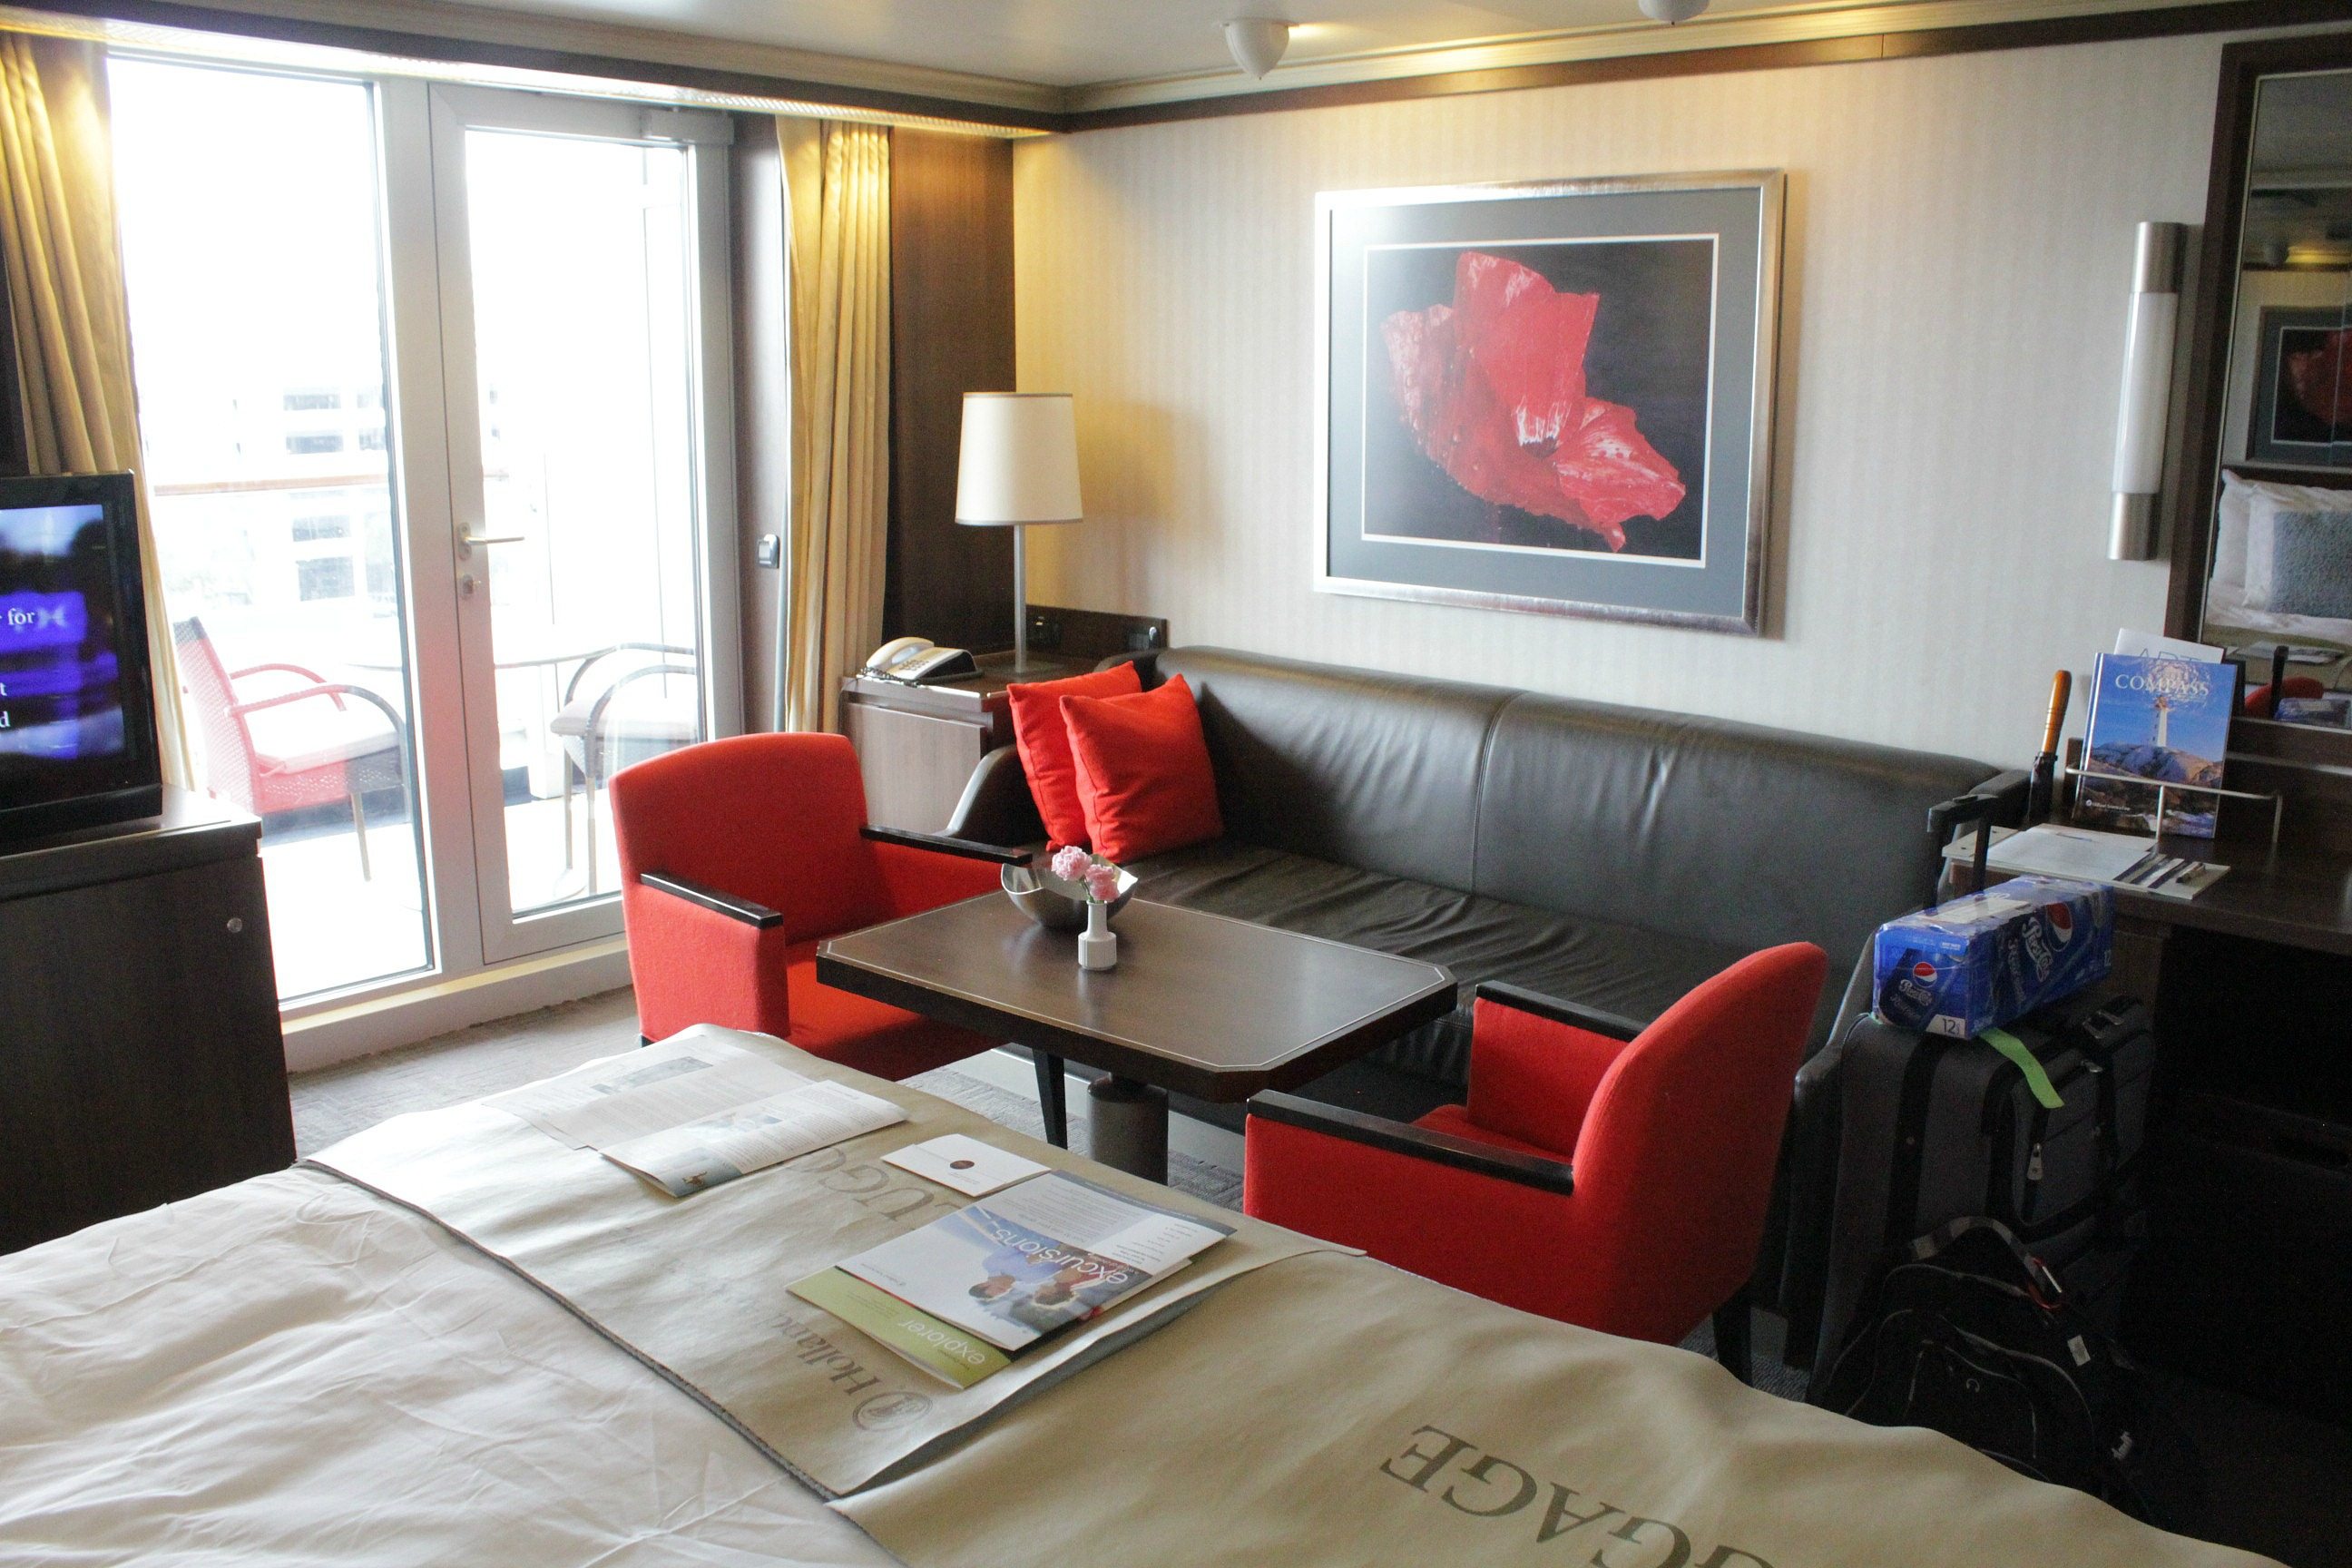 eurodam cabin 6096 holland america